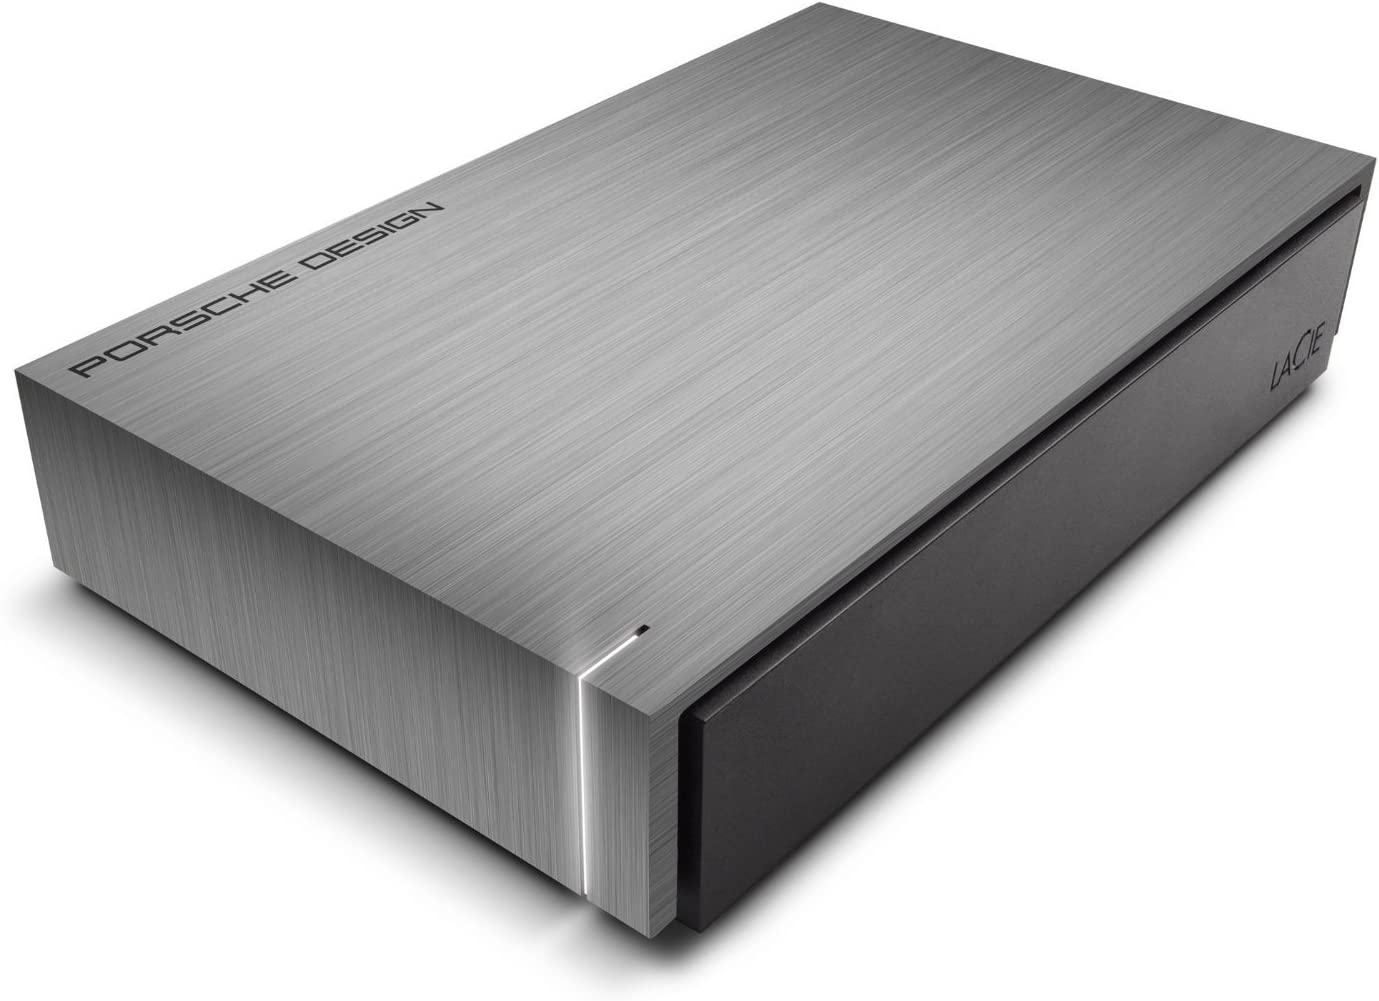 Lacie Porsche Design 3tb Usb 3 0 Desktop 3 5 Inch External Hard Drive For Pc And Mac